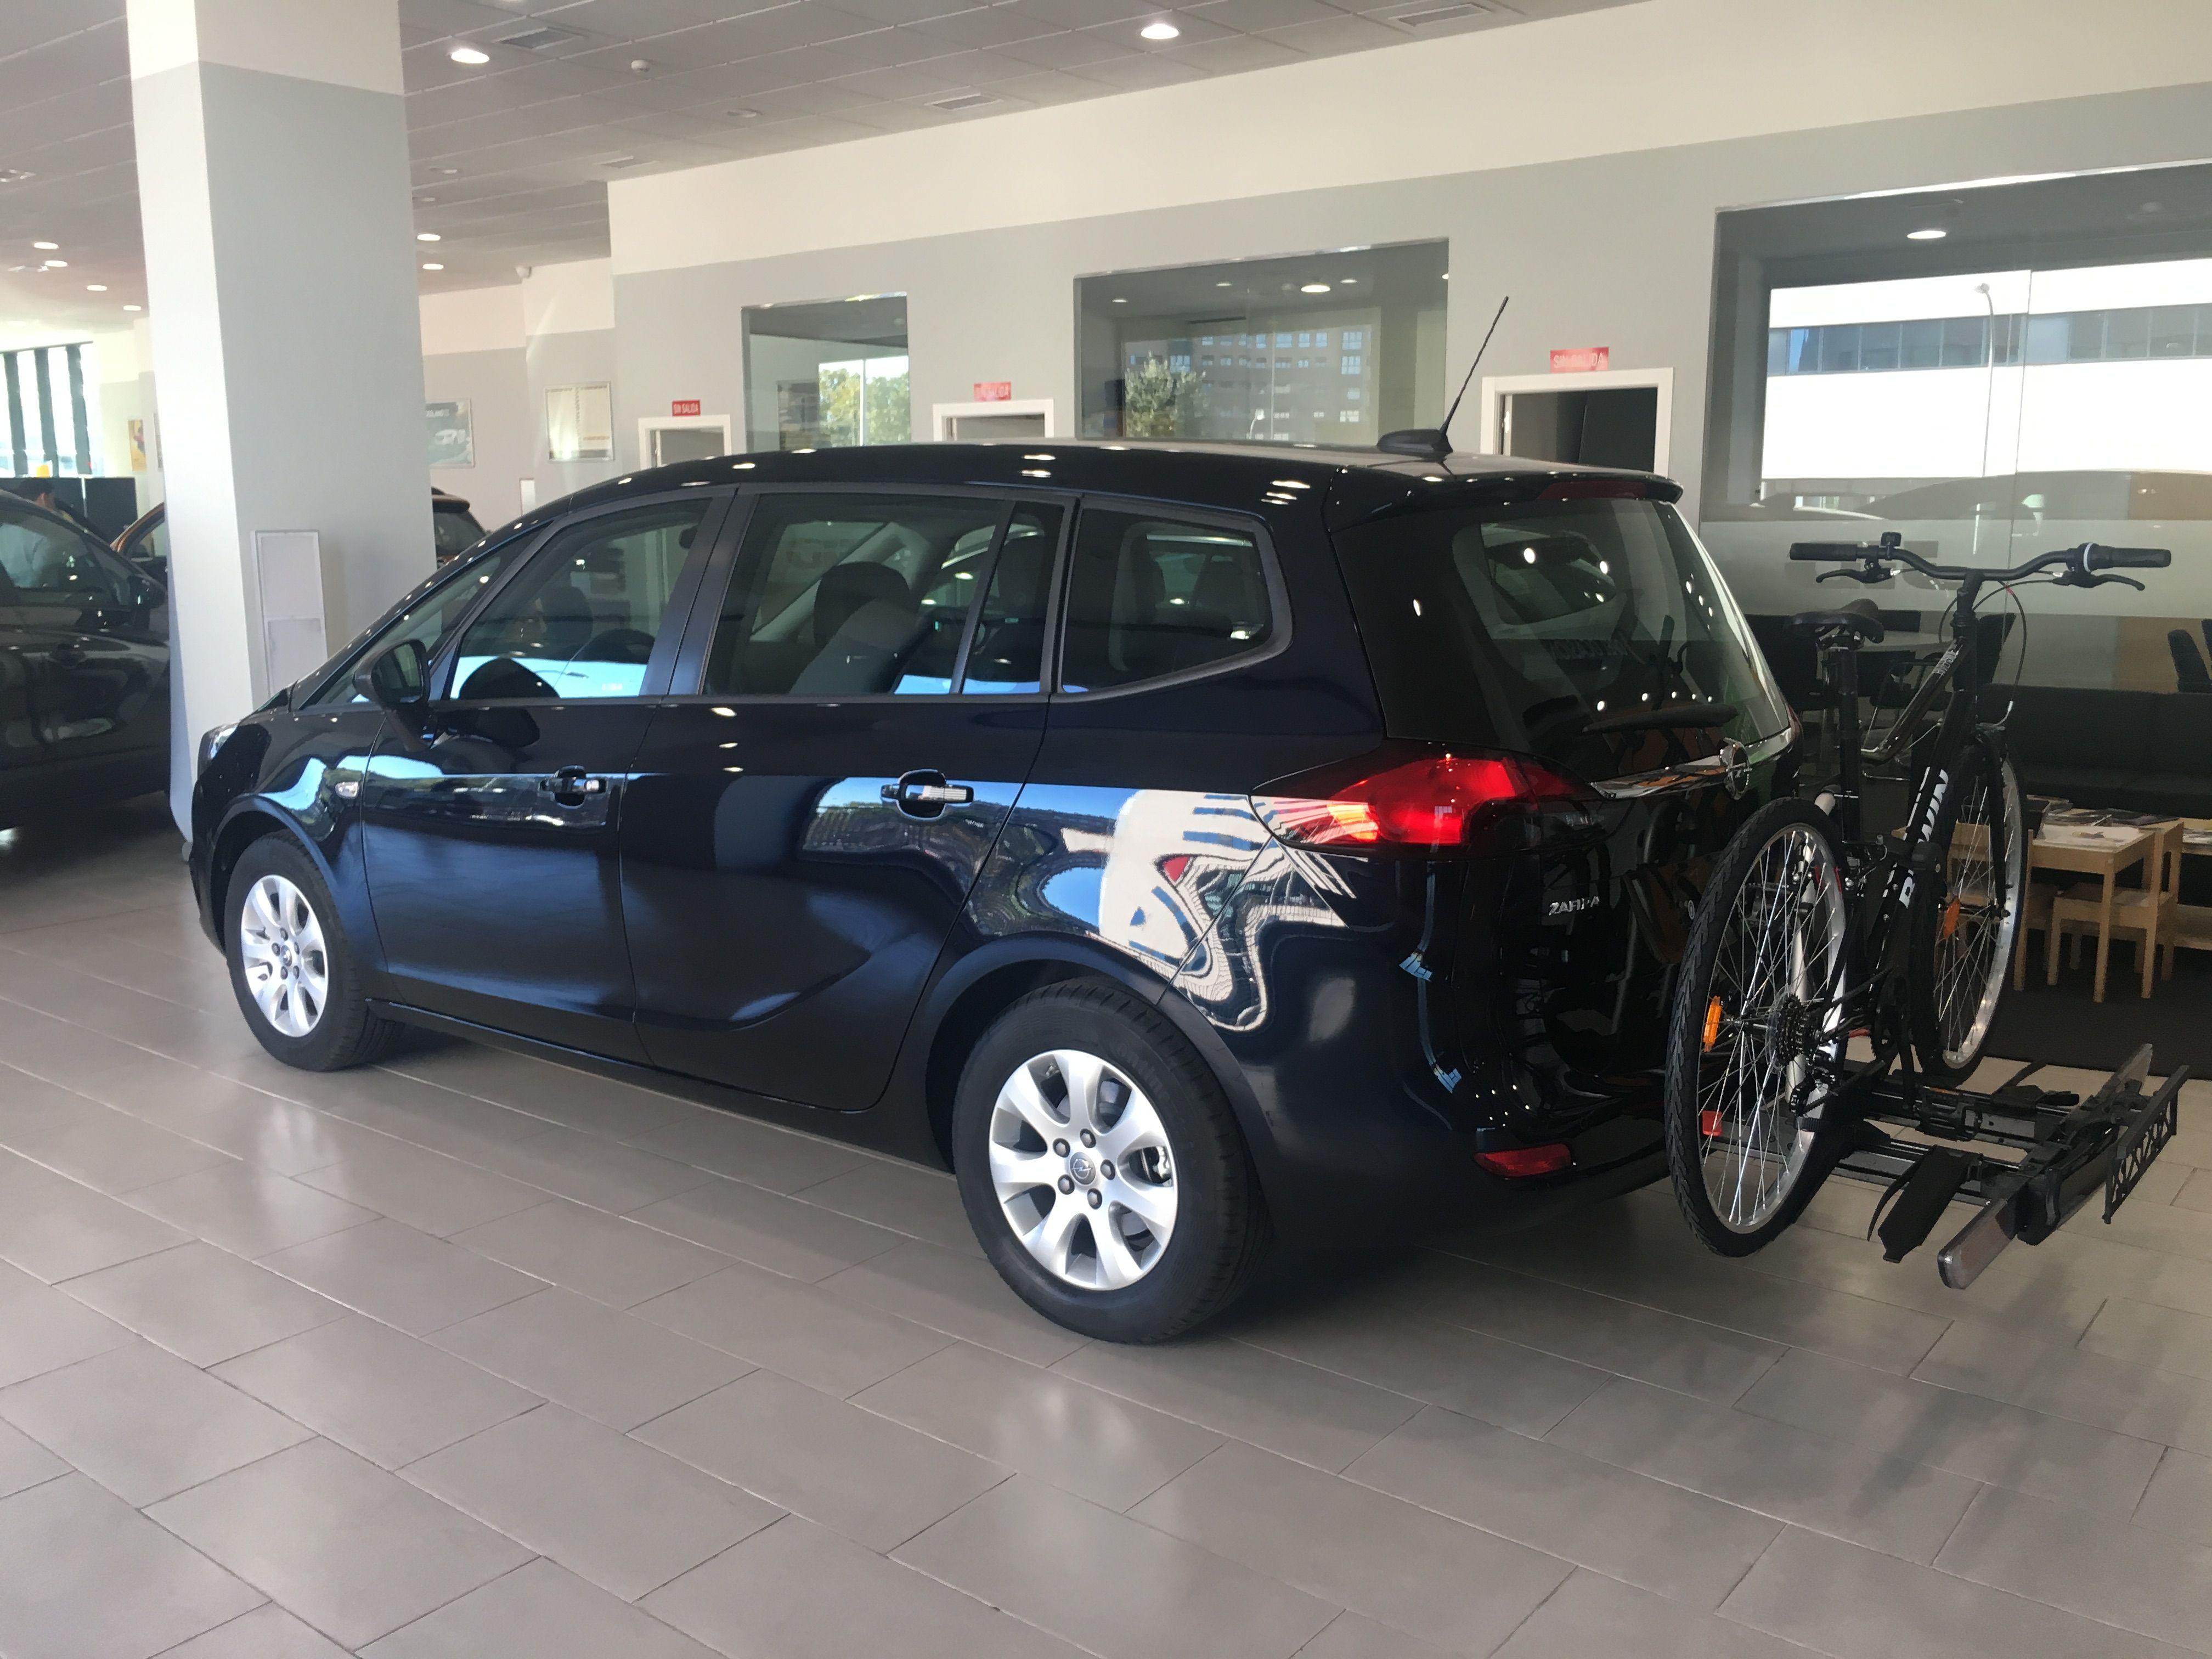 OFERTA ESPECIAL / 19.990€/ Opel Zafira Selectiv 1.6 CDTi S/S (134CV) 6V